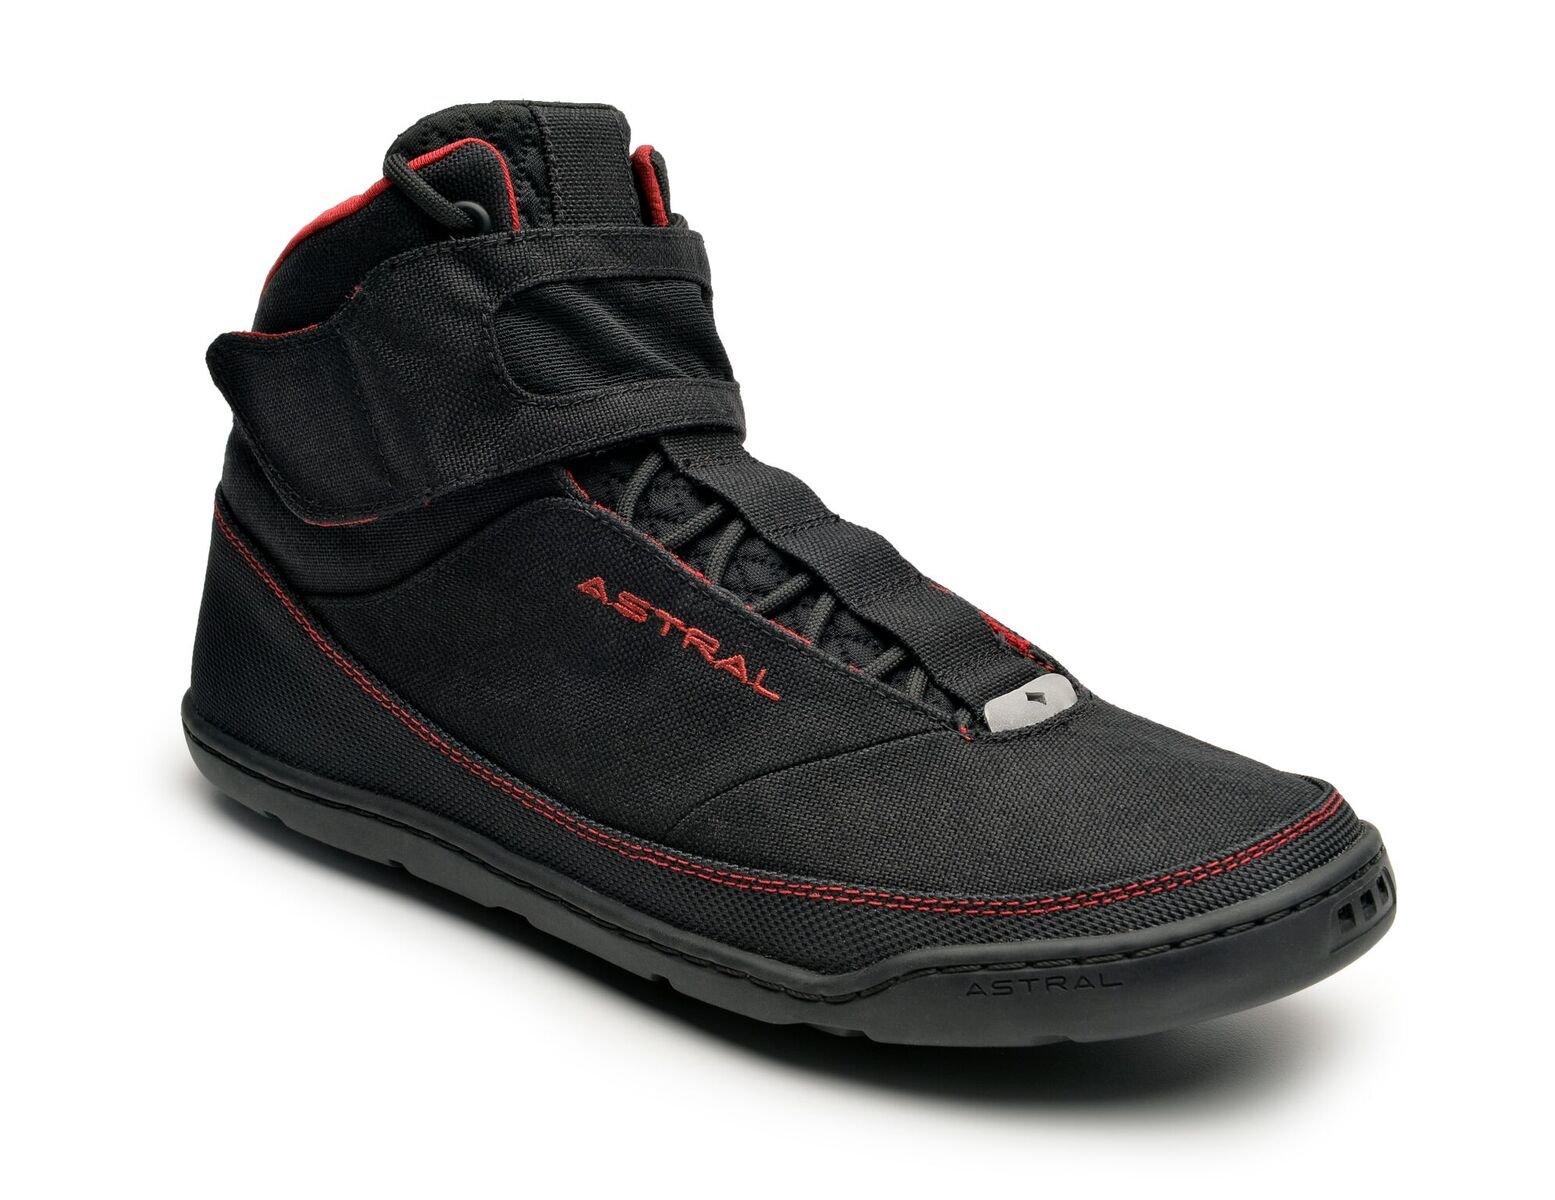 Astral Hiyak Paddle Boot